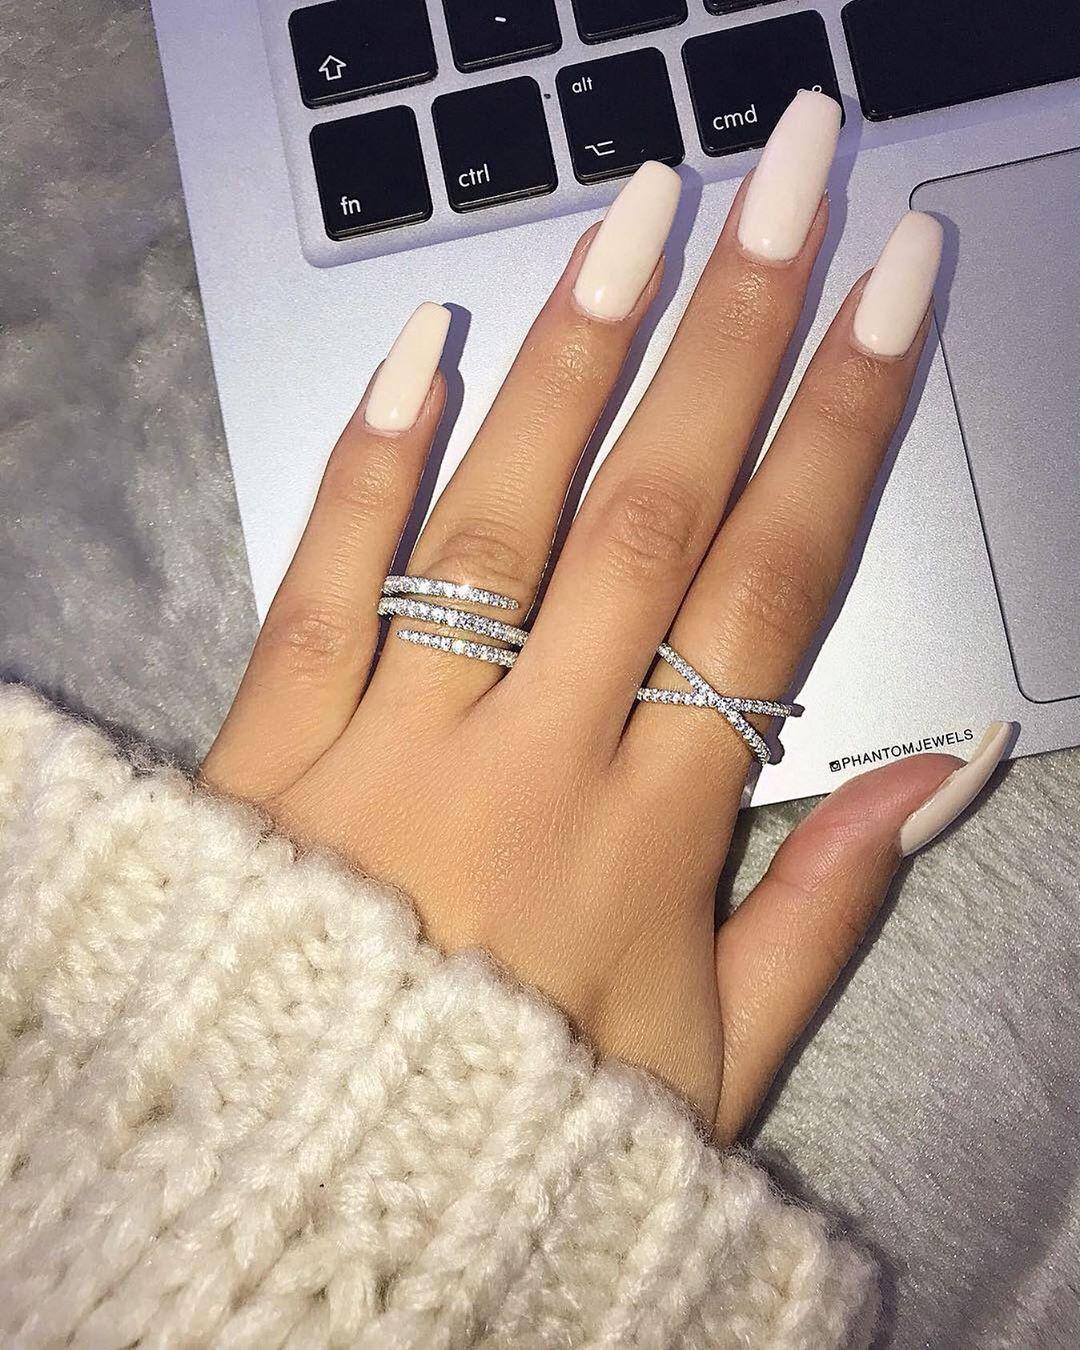 Pin By Karolina Ch On Nails In 2020 Paznokcie Sylwestrowe